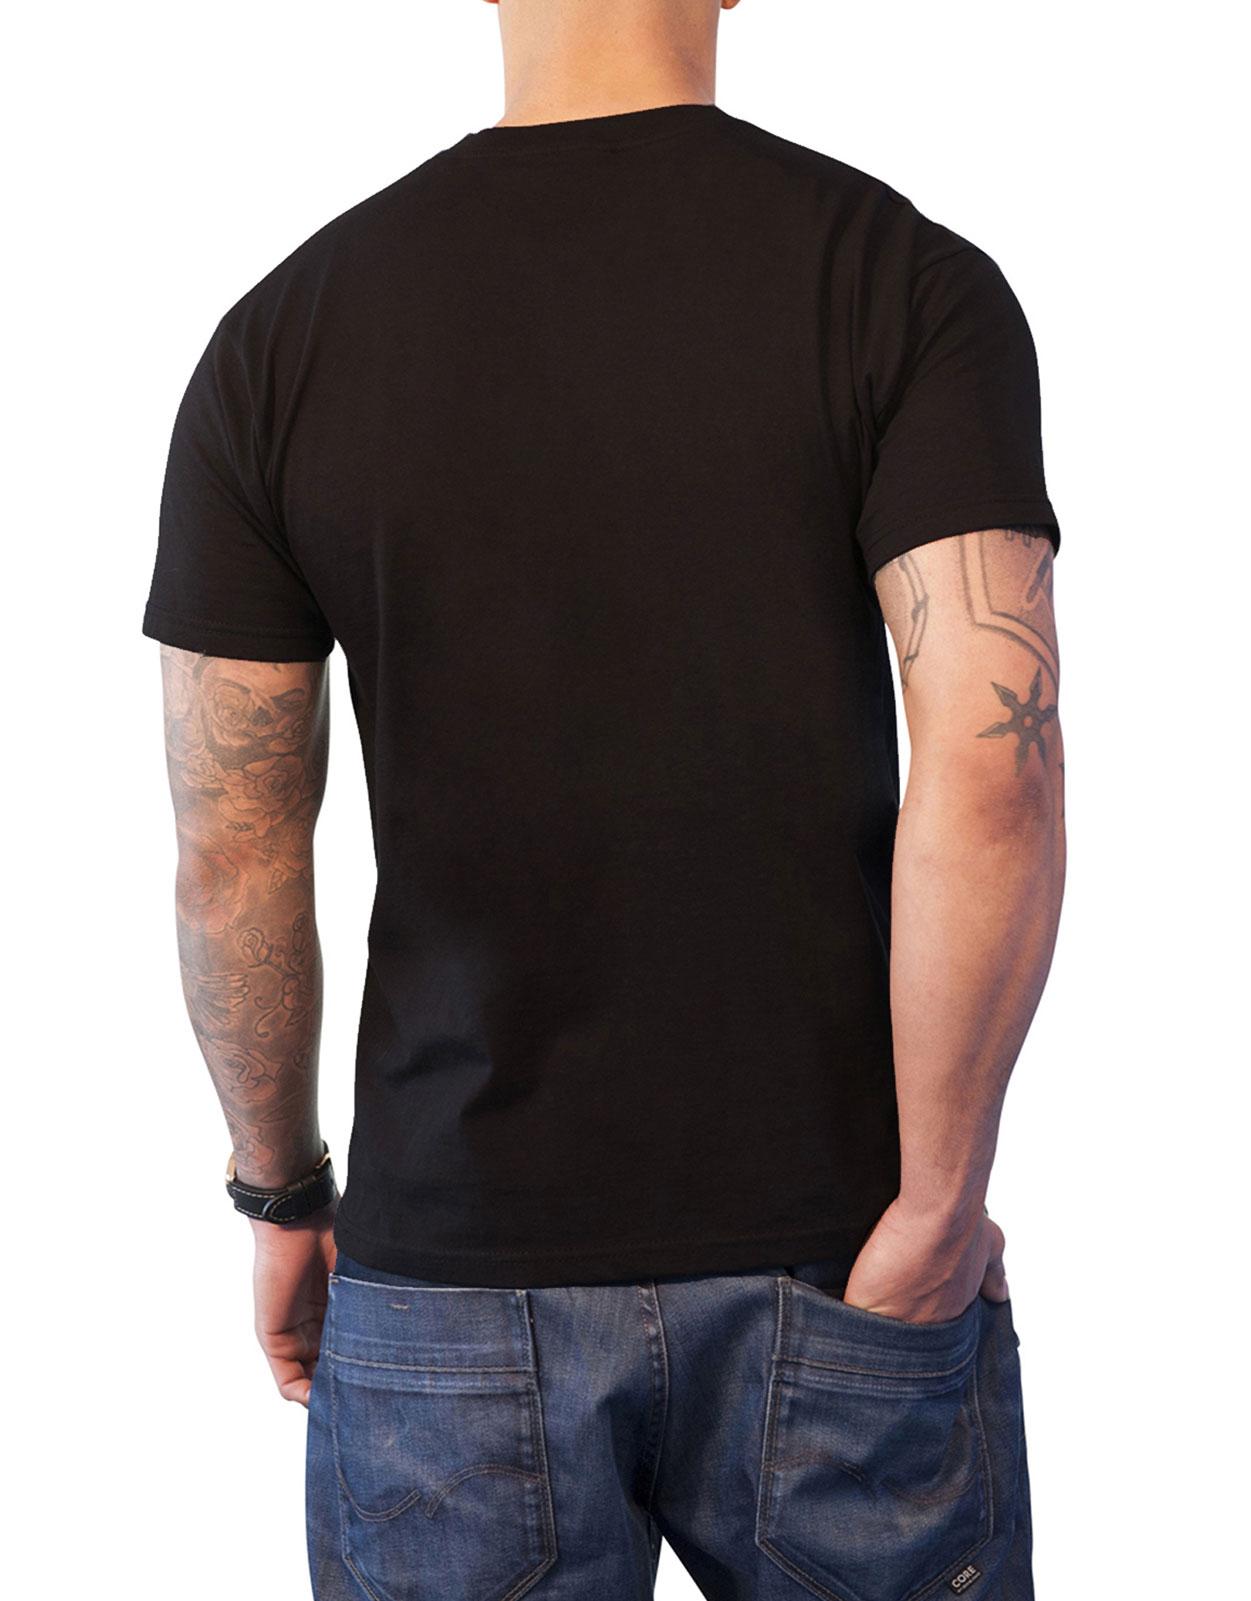 Officiel-Metallica-T-shirt-filaire-justice-for-all-RTL-Band-Logo-Homme-Nouveau miniature 19